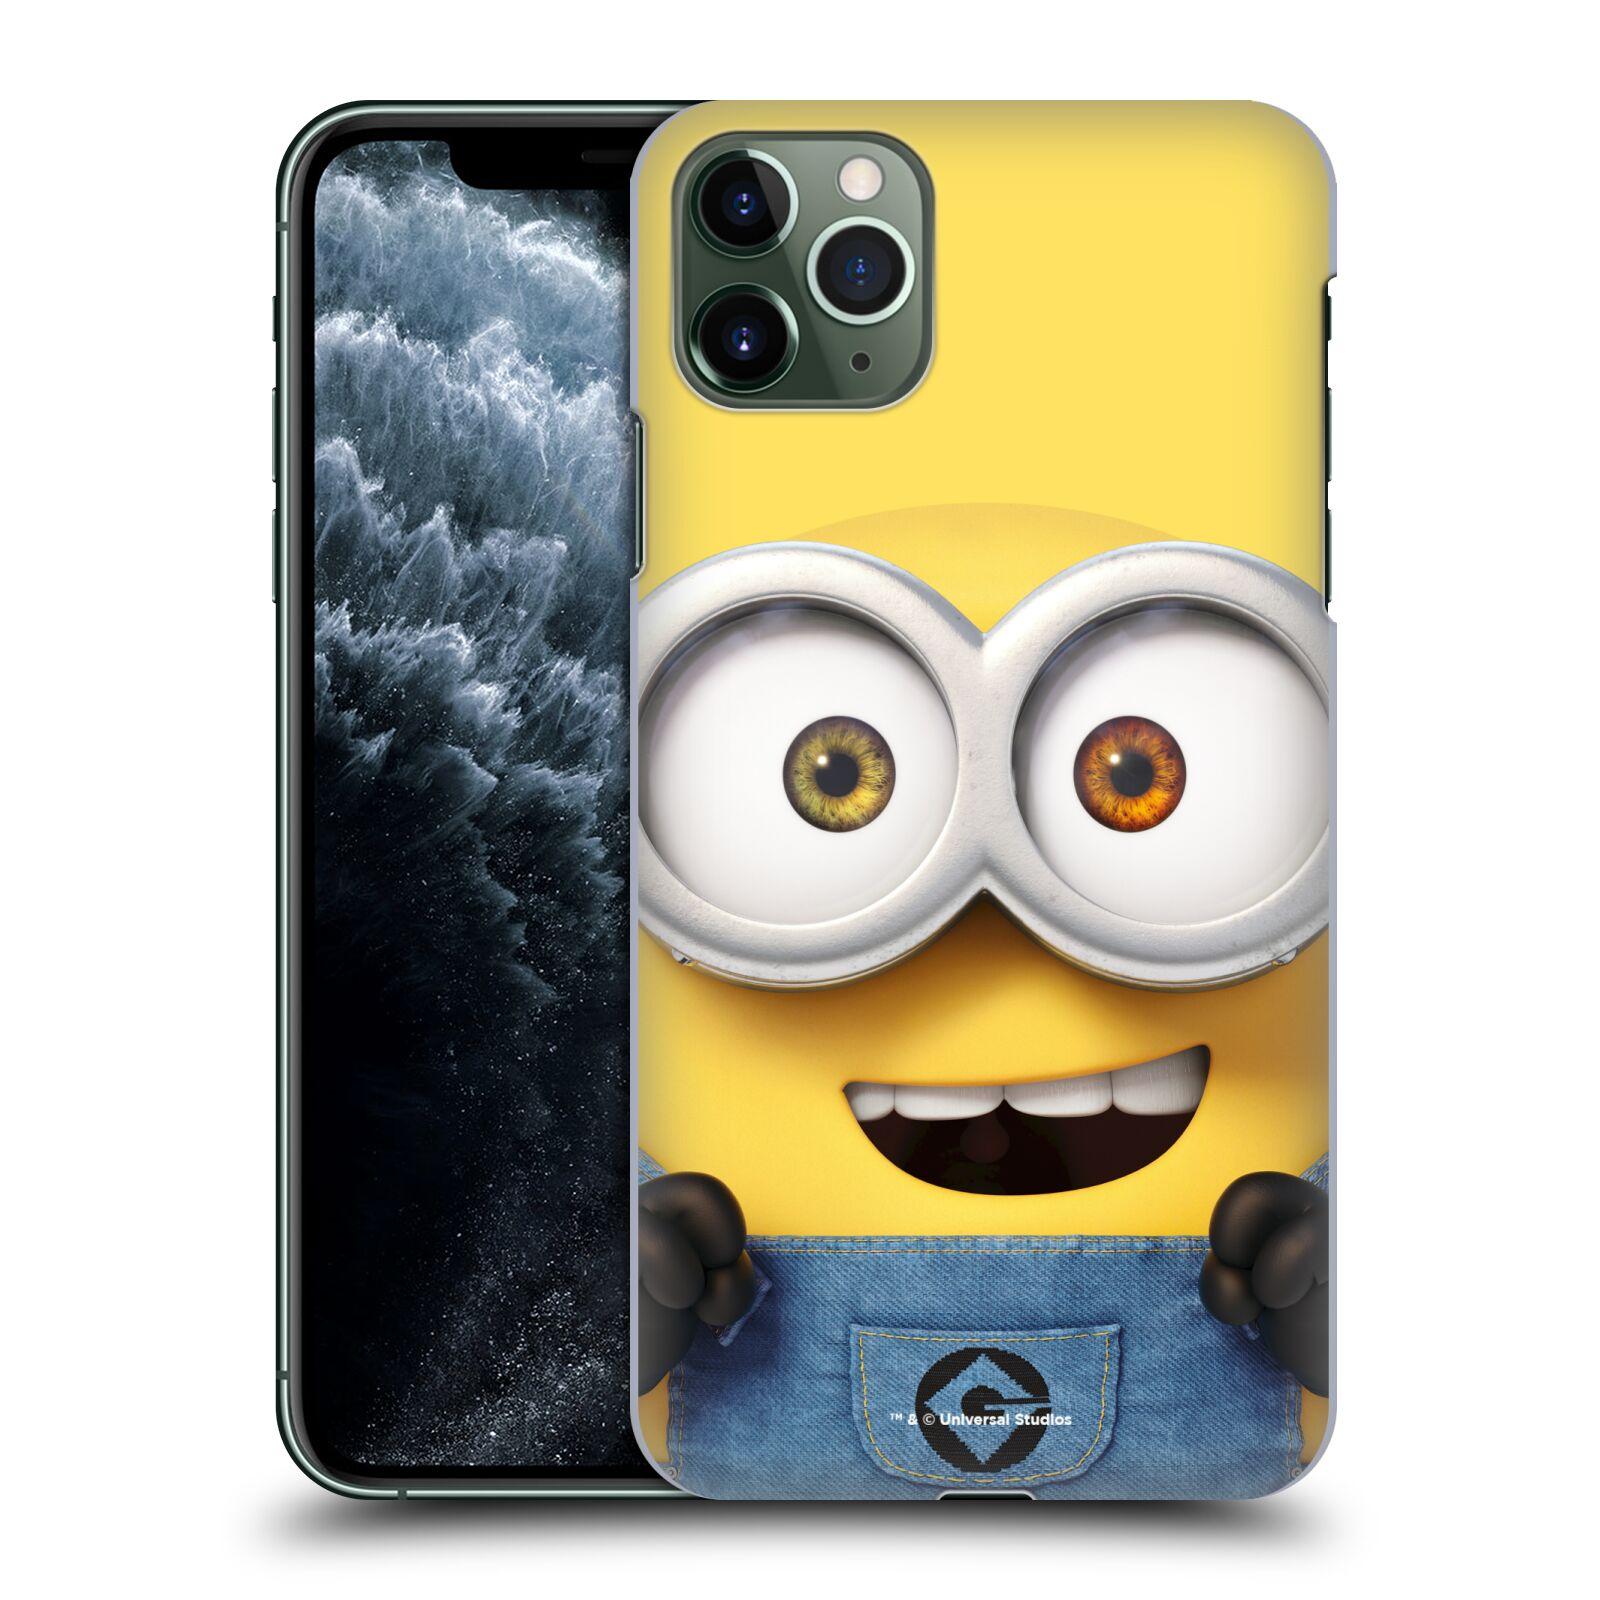 Plastové pouzdro na mobil Apple iPhone 11 Pro Max - Head Case - Mimoň Bob z filmu Já, padouch - Despicable Me